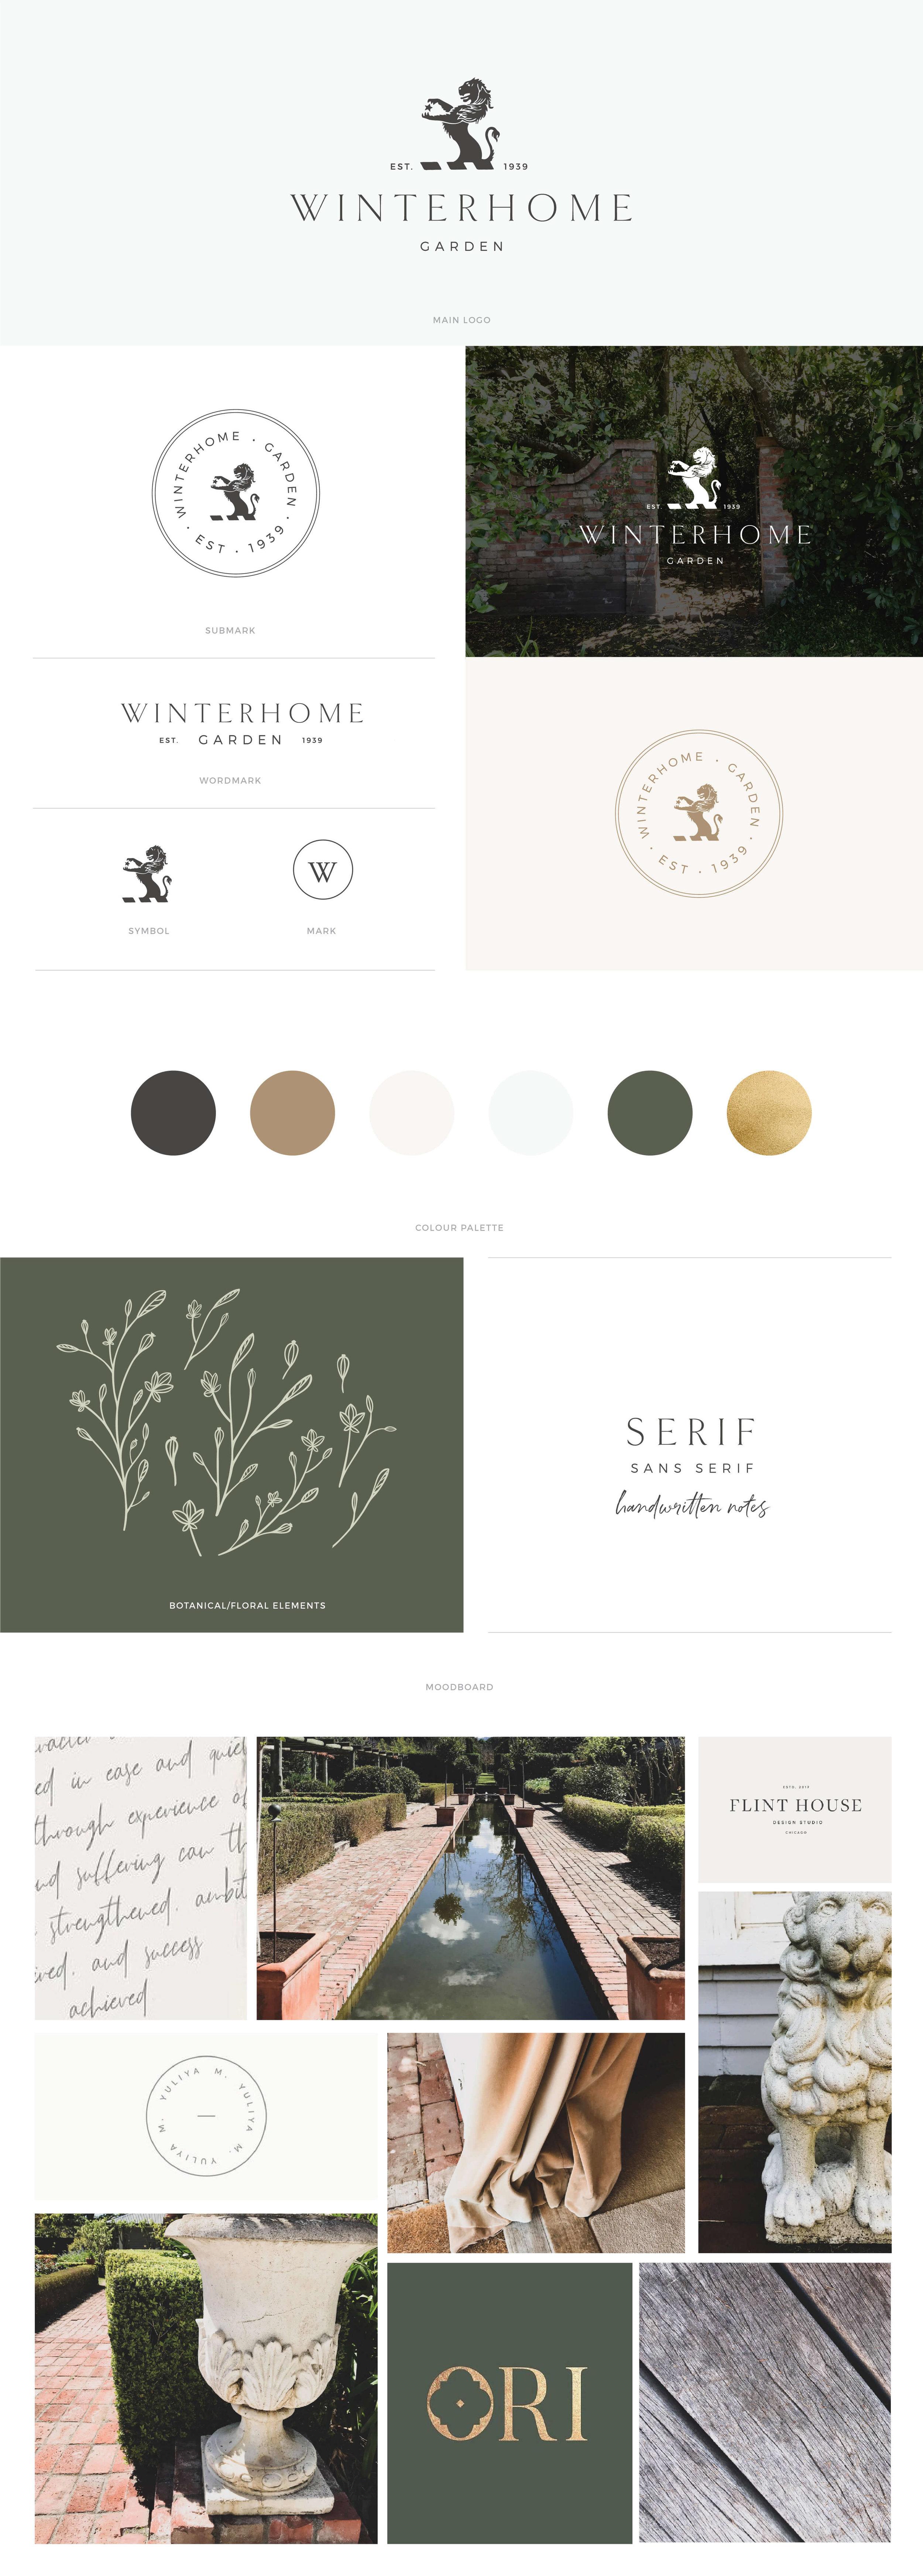 Winterhome Garden brandboard - by January Made Design